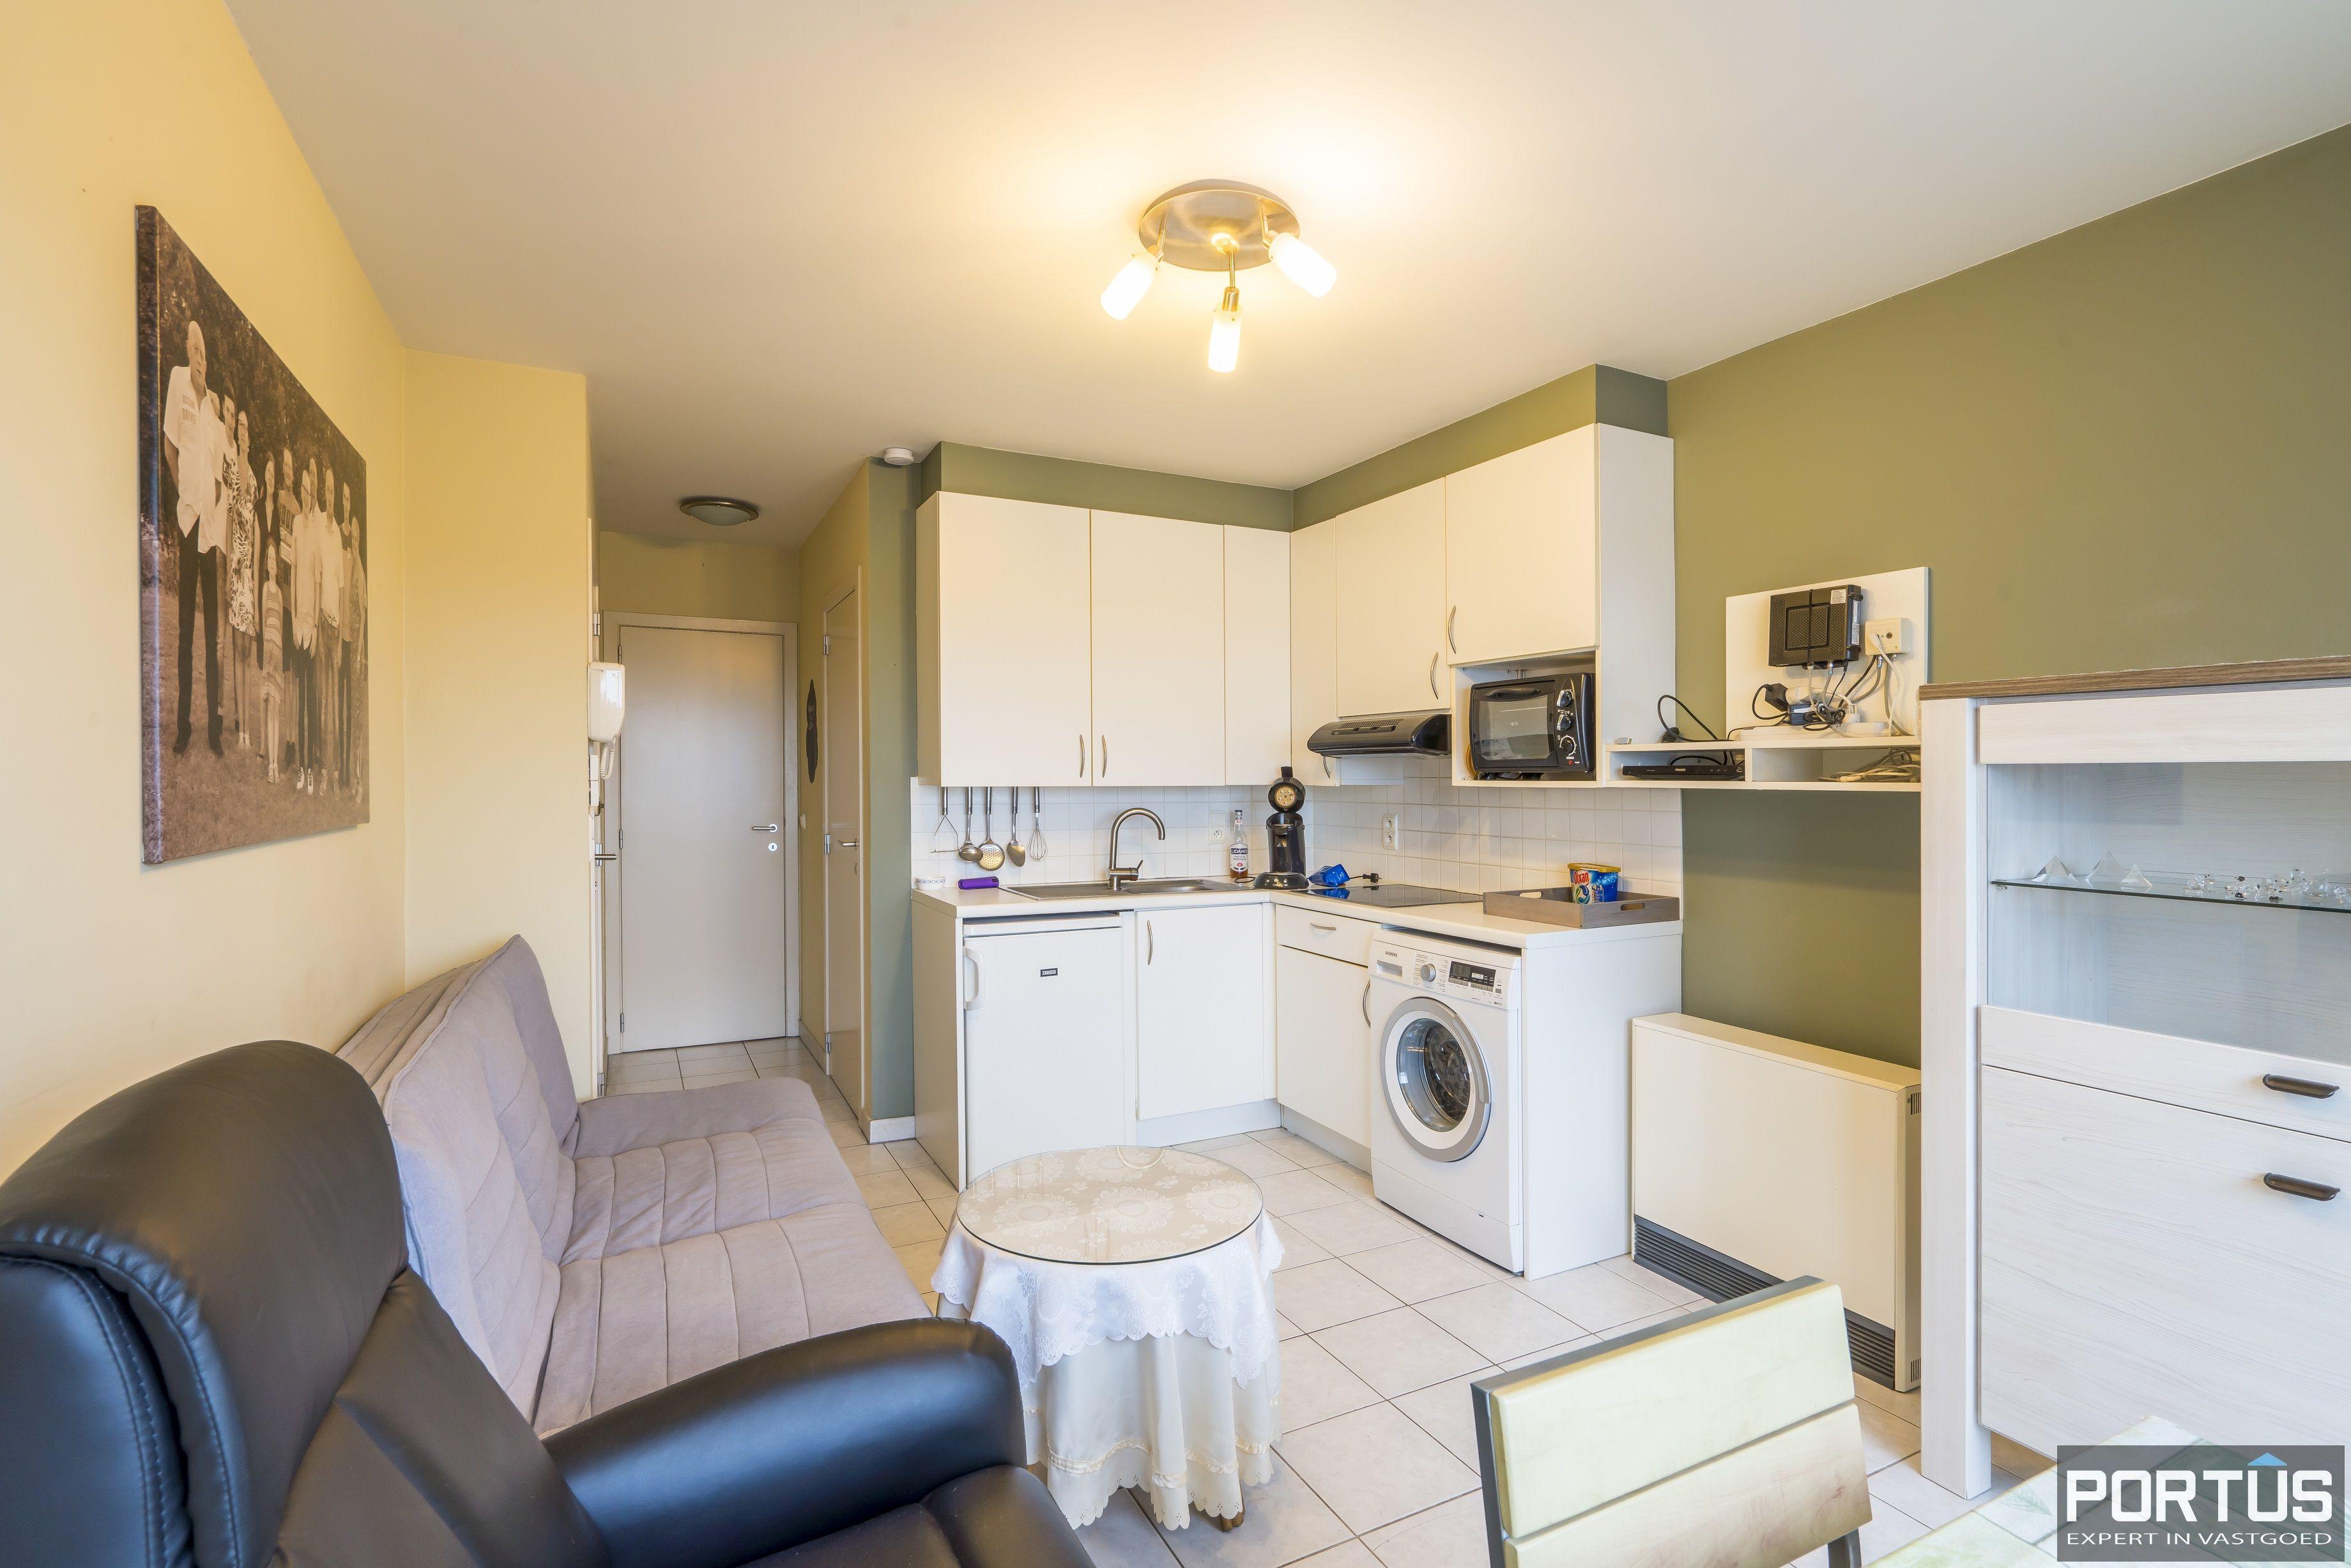 Instapklaar appartement met 1 slaapkamer te koop te Westende - 12057